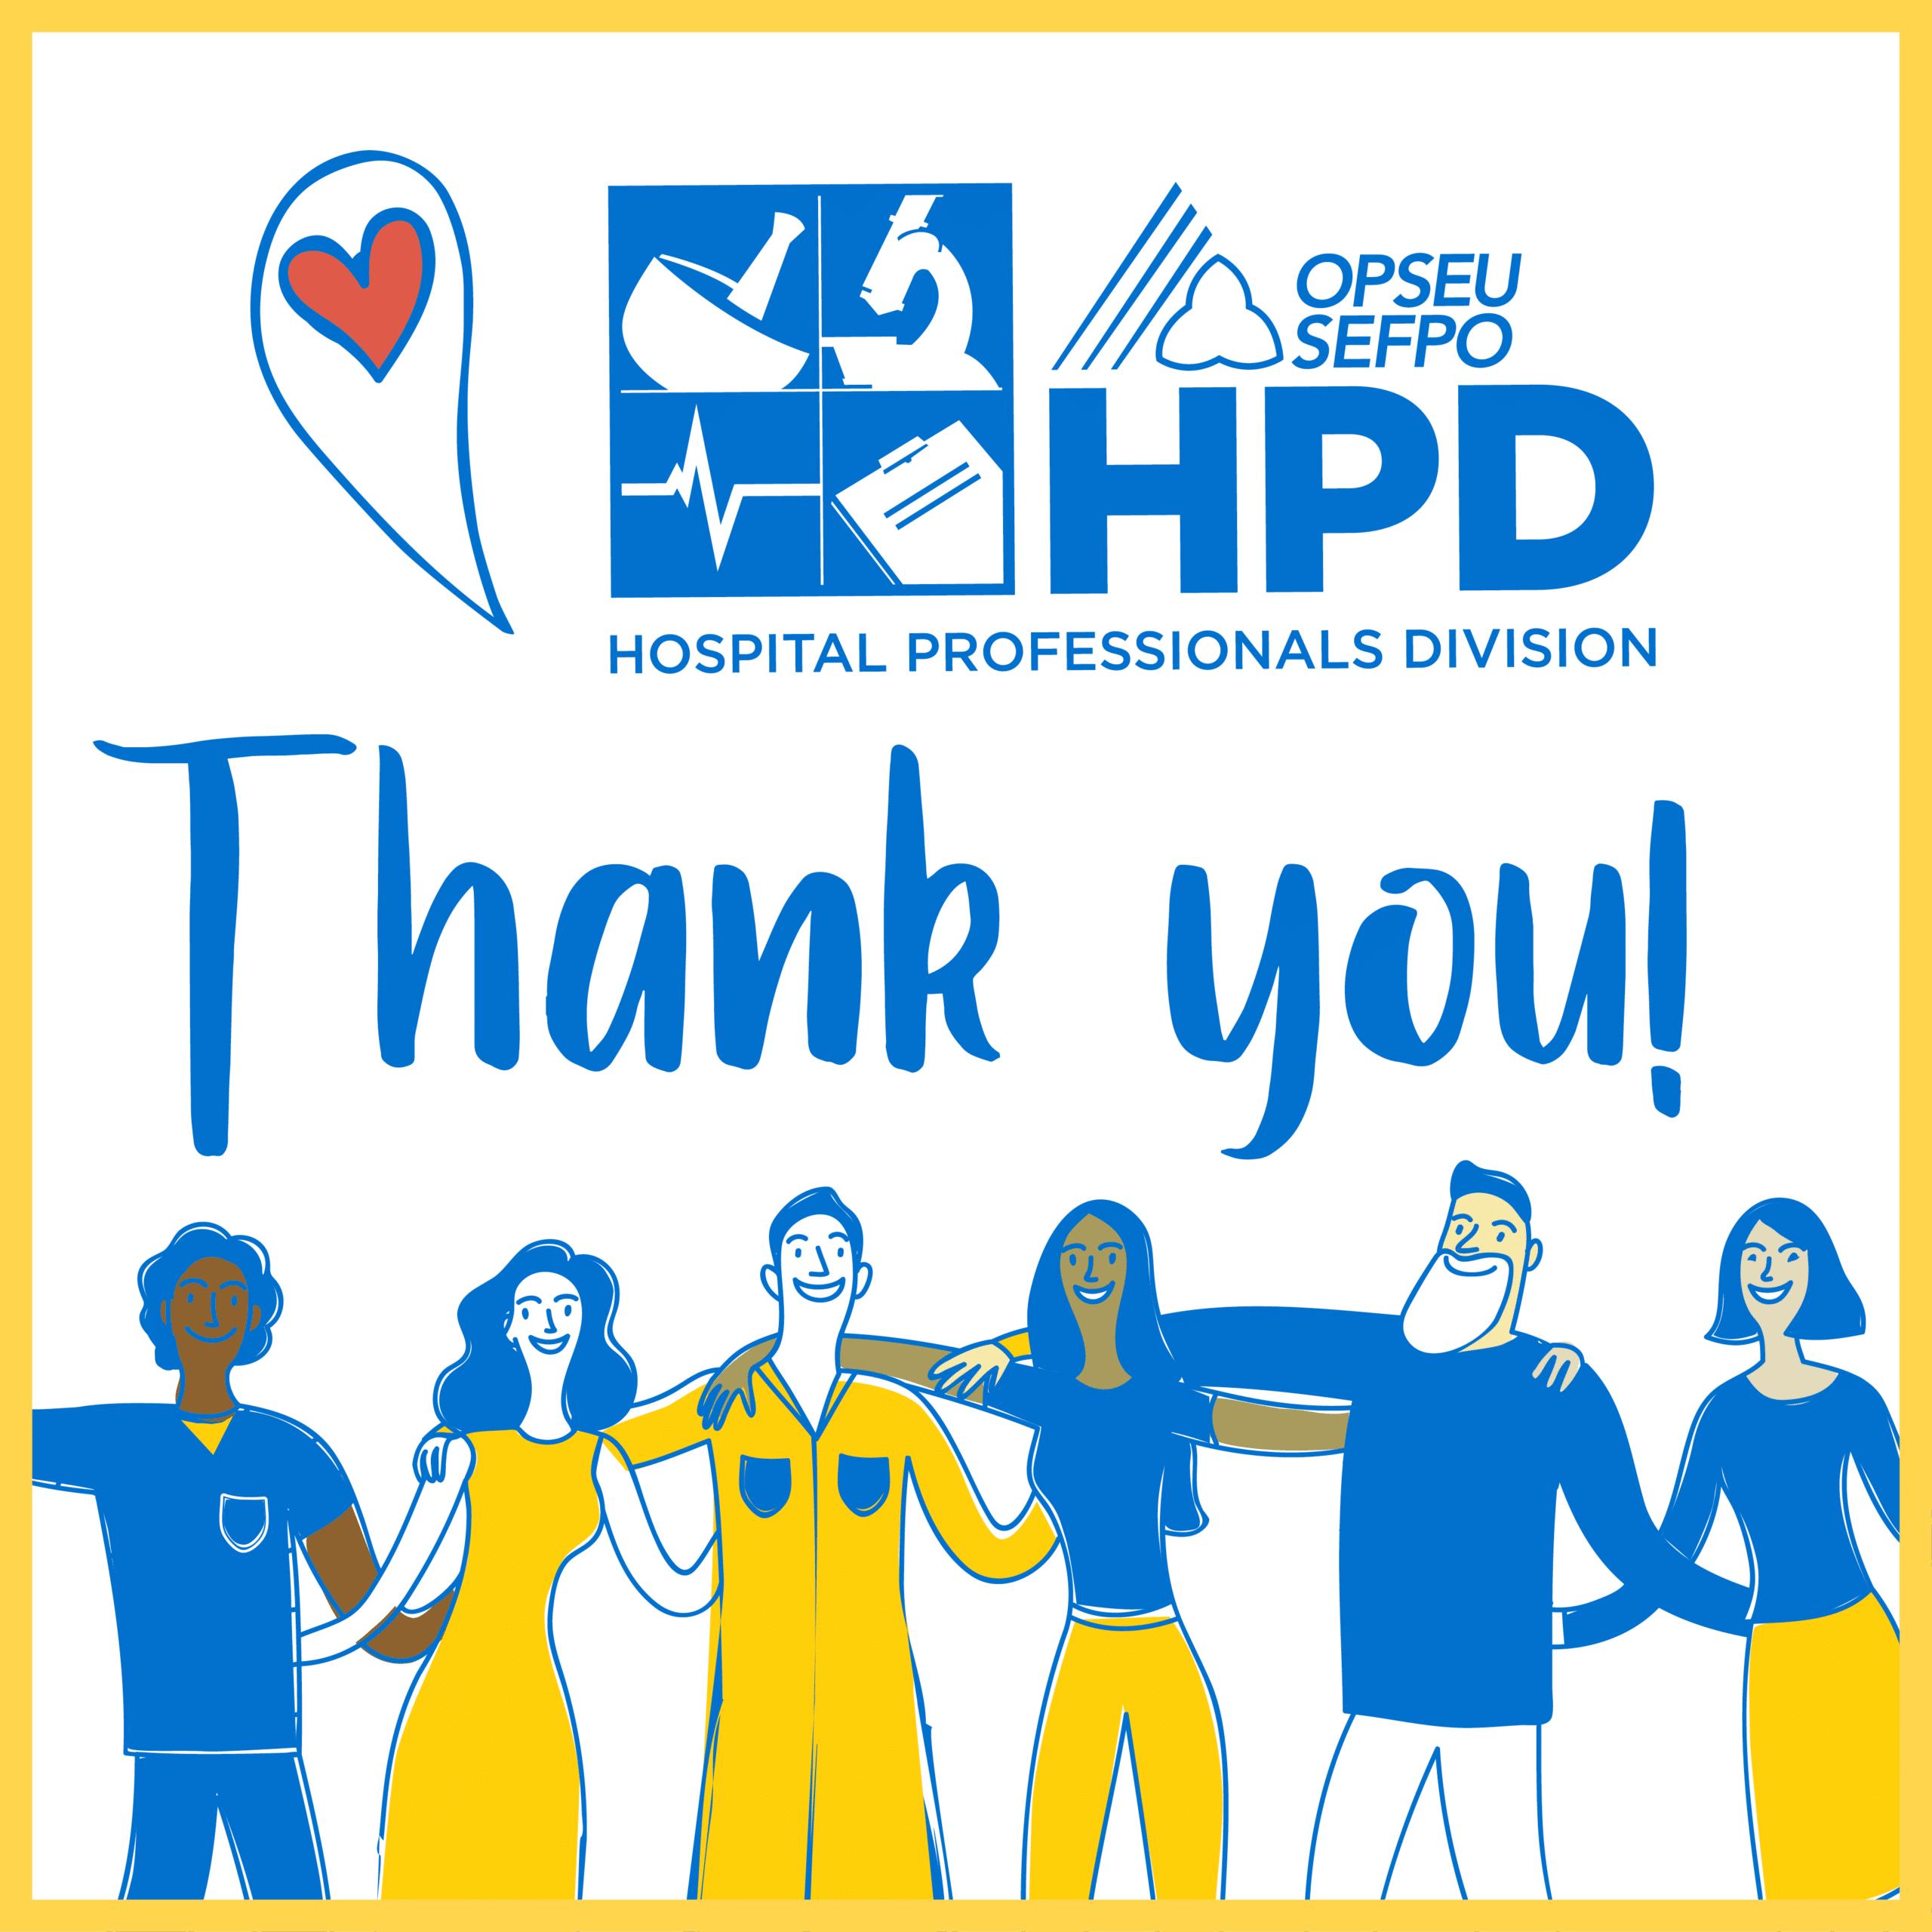 Thank you! OPSEU Hospital Professionals Division